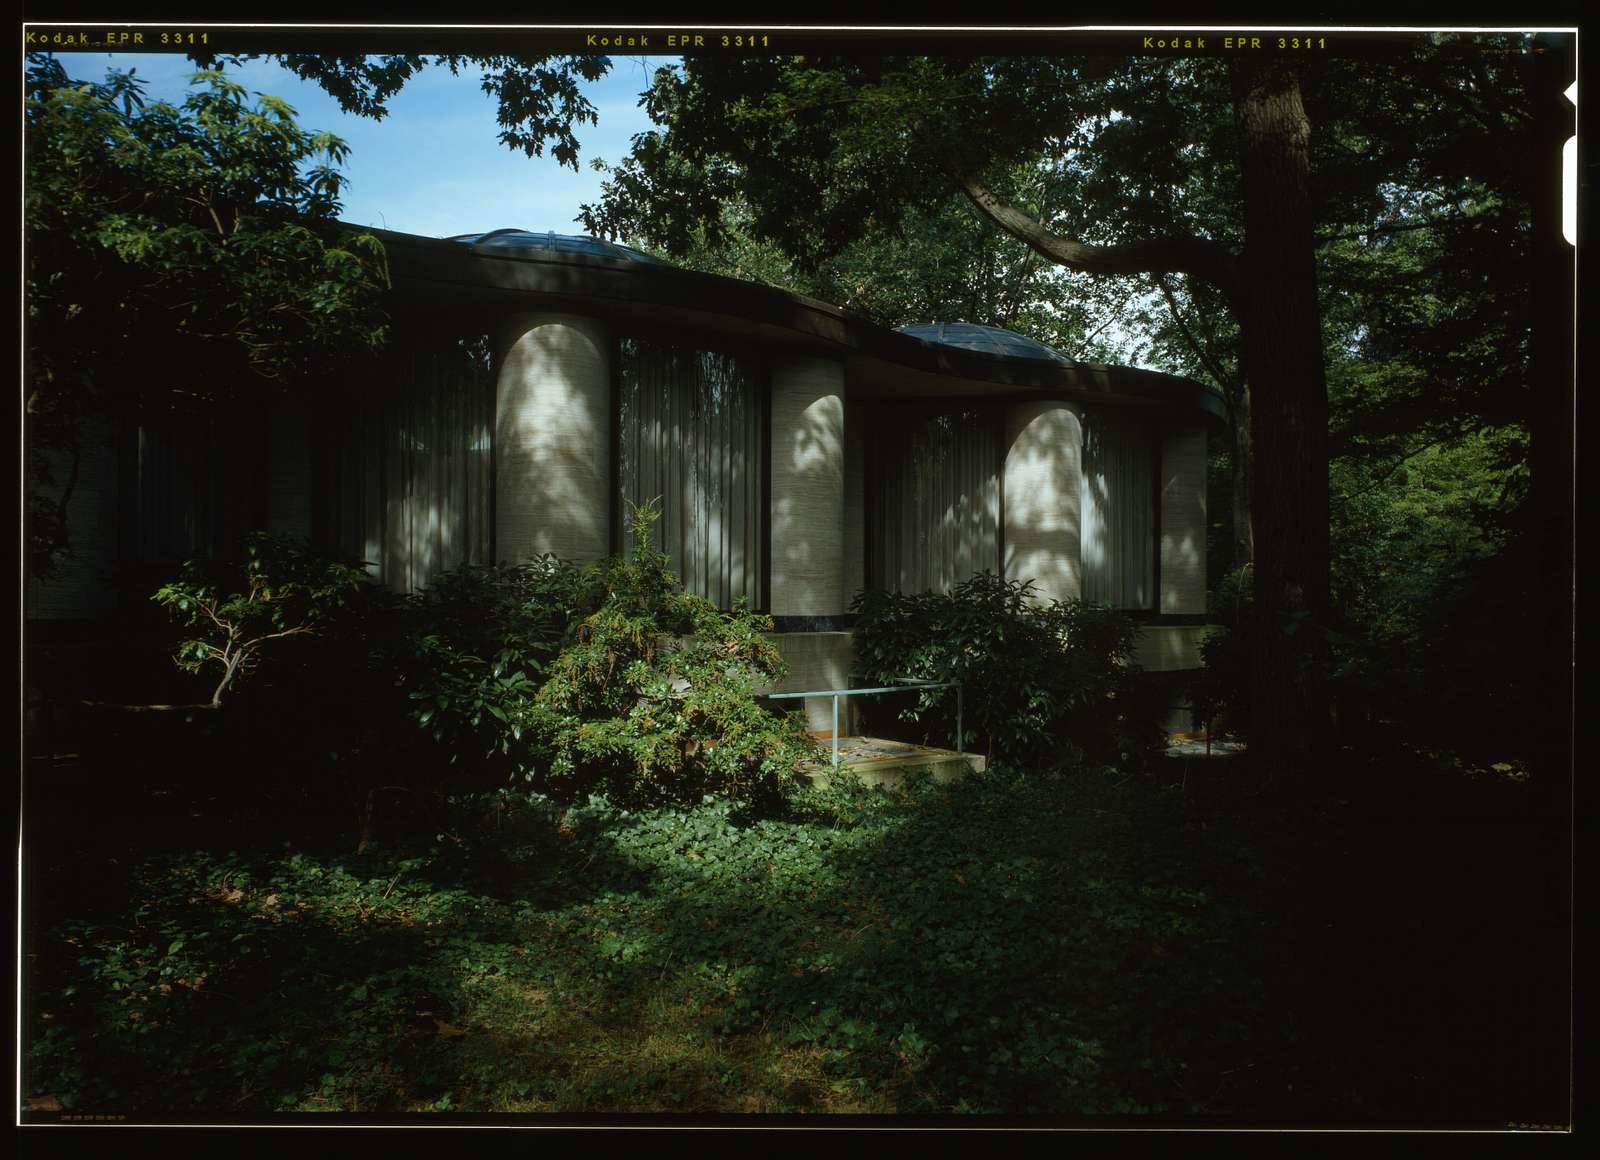 Dumbarton Oaks, 3101 R Street, Northwest, Washington, District of Columbia, DC